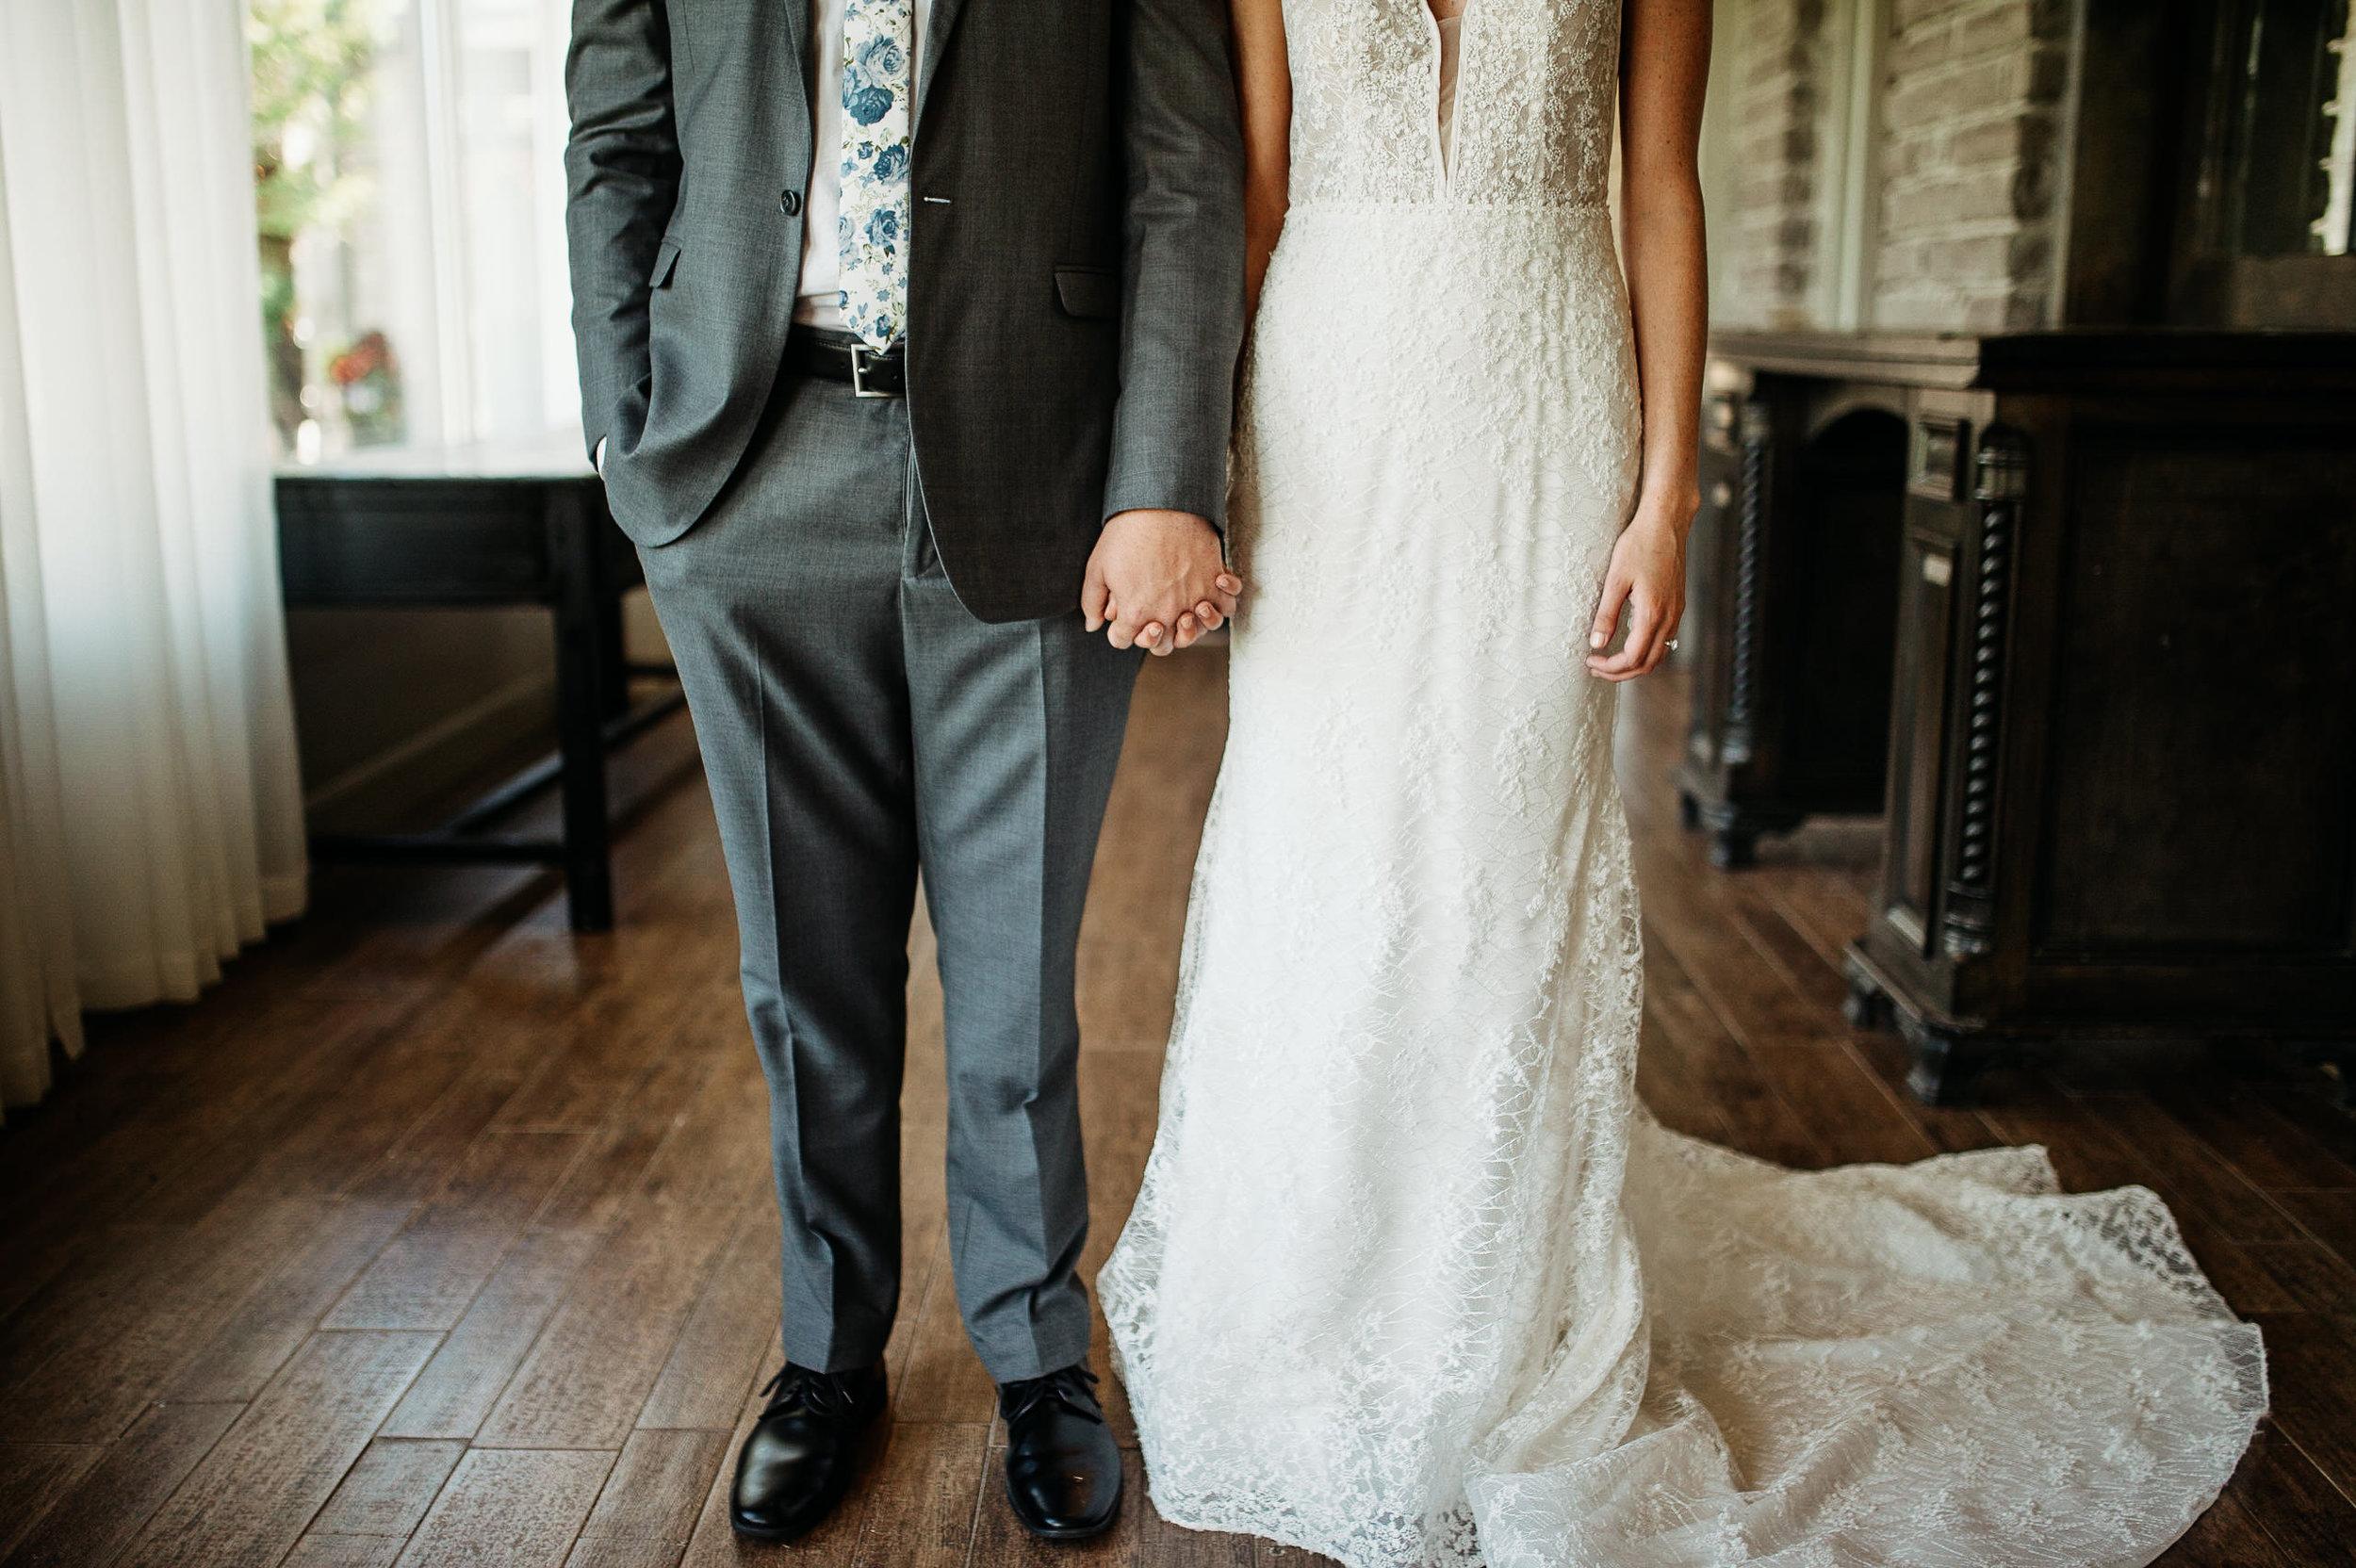 okc-wedding-photographer-coles-garden-wedding-okc-best-wedding-photographers-91.jpg